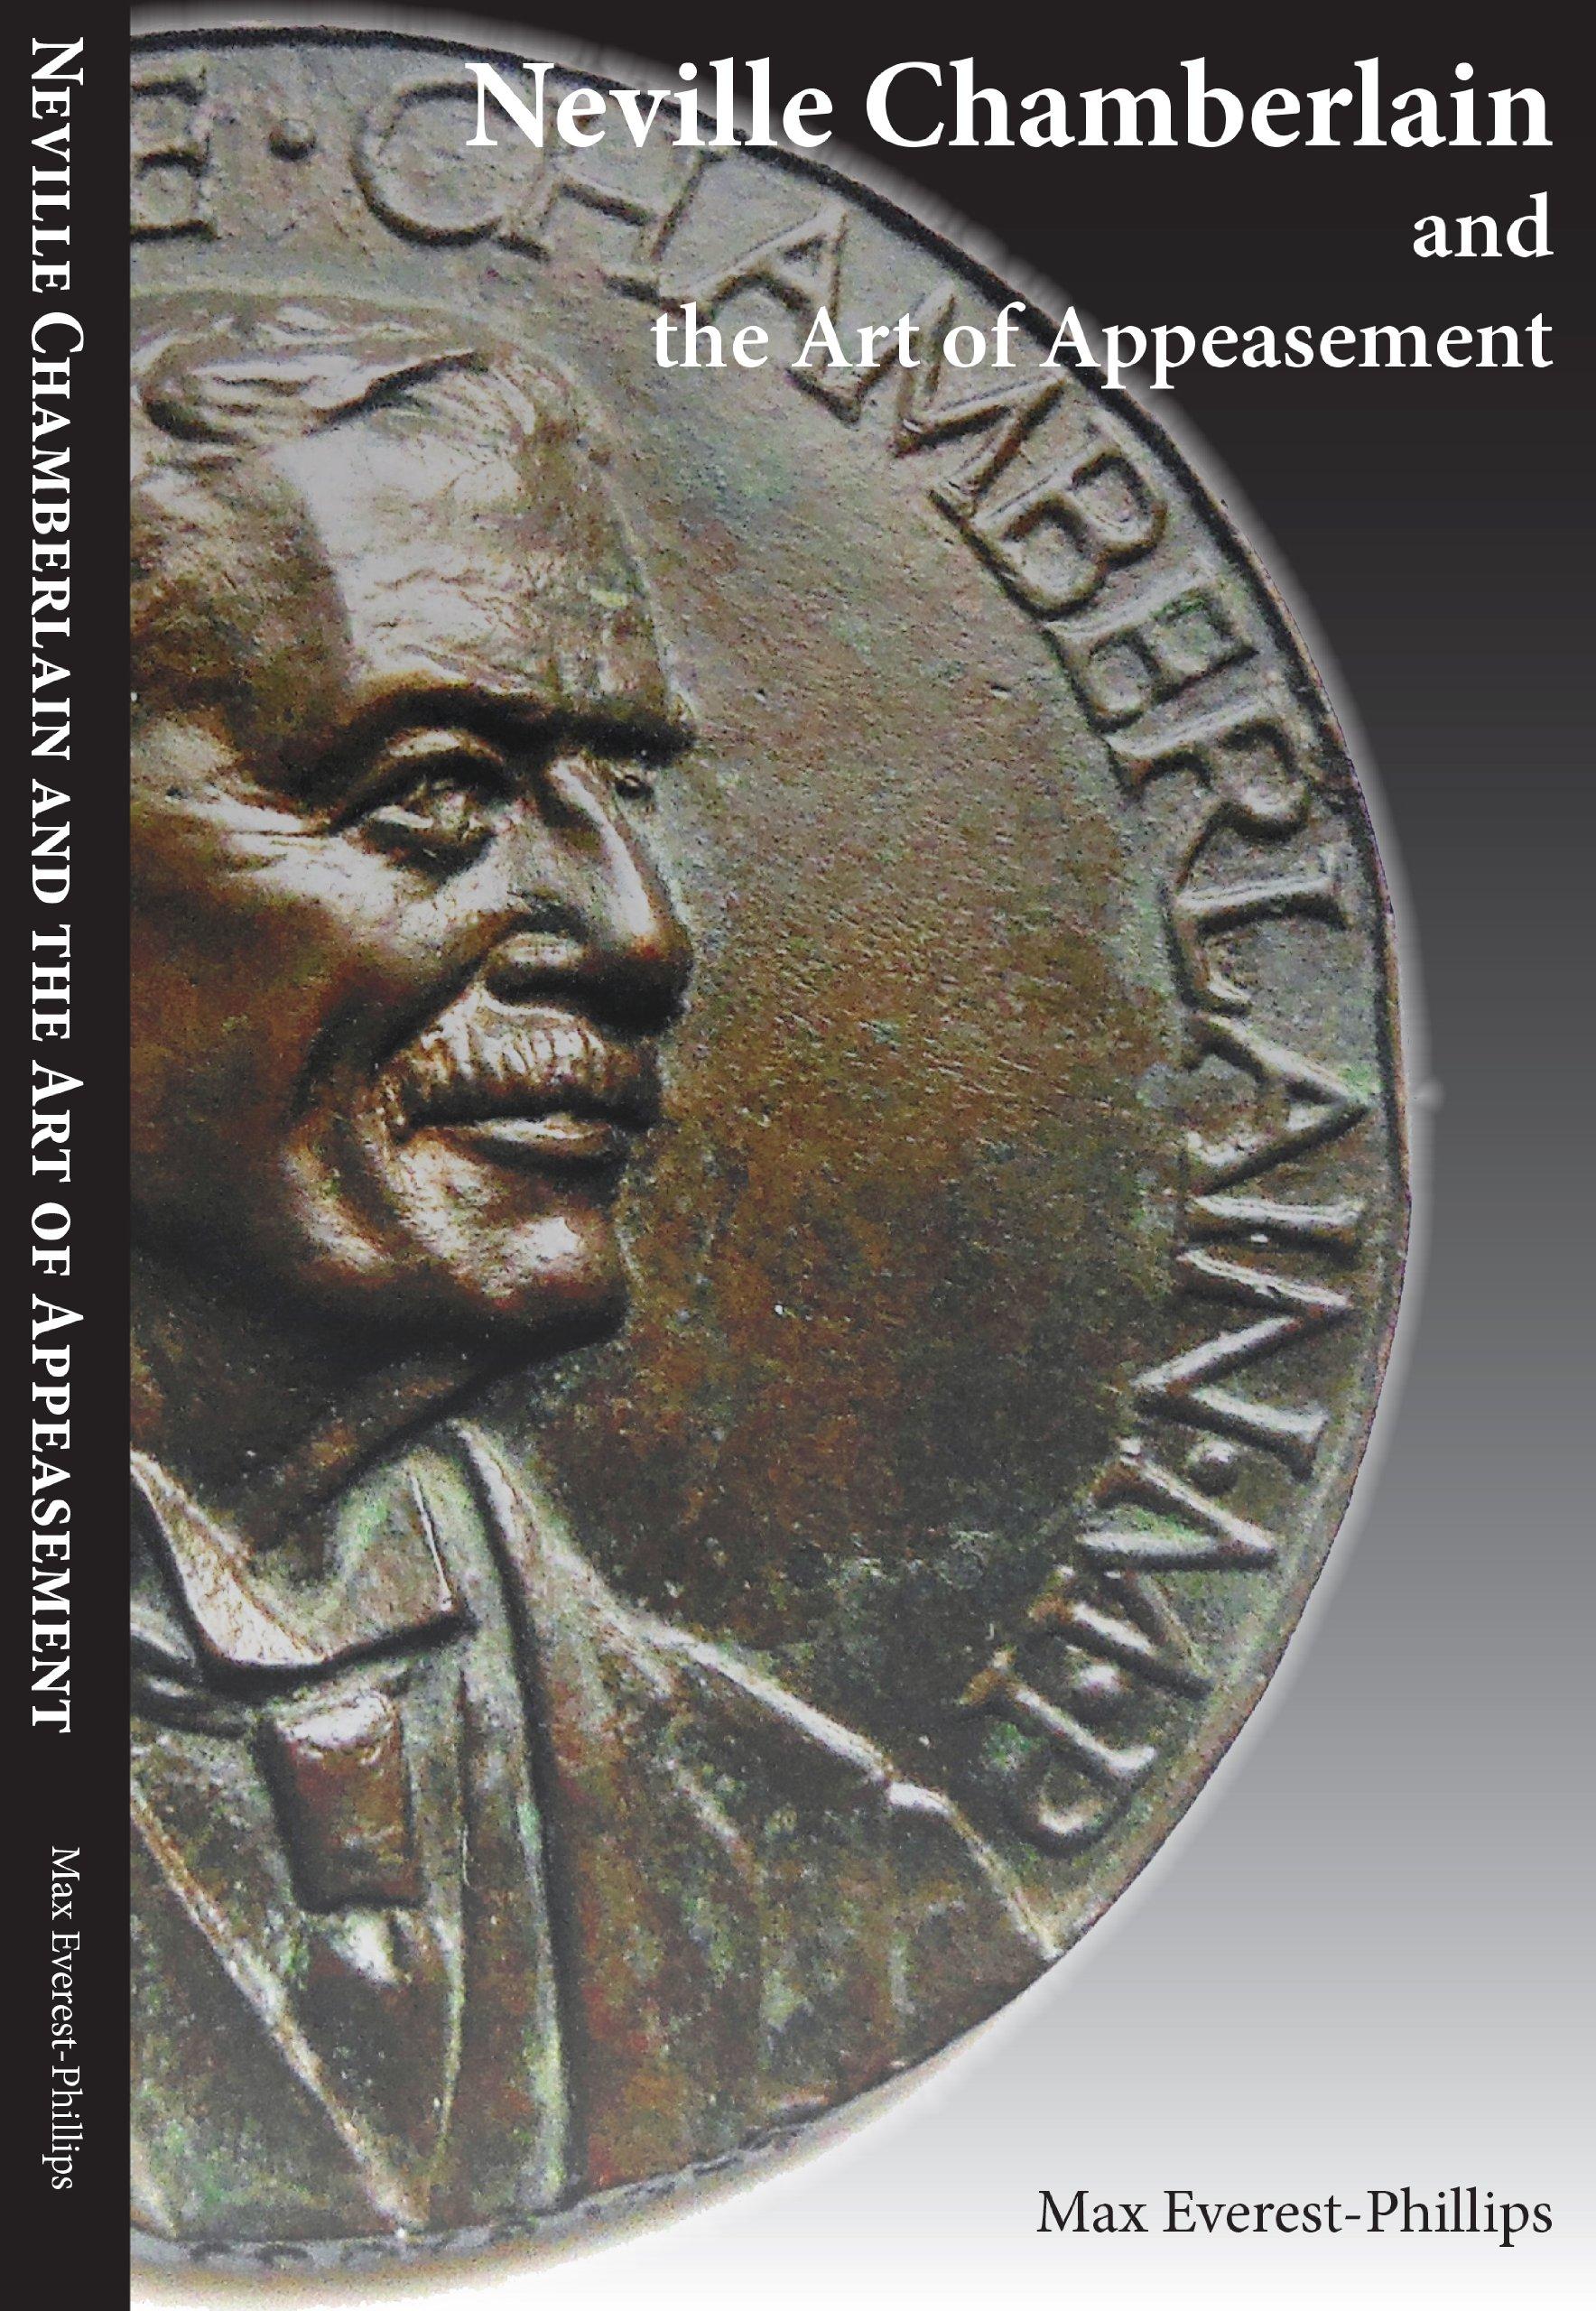 Neville Chamberlain and the Art of Appeasement